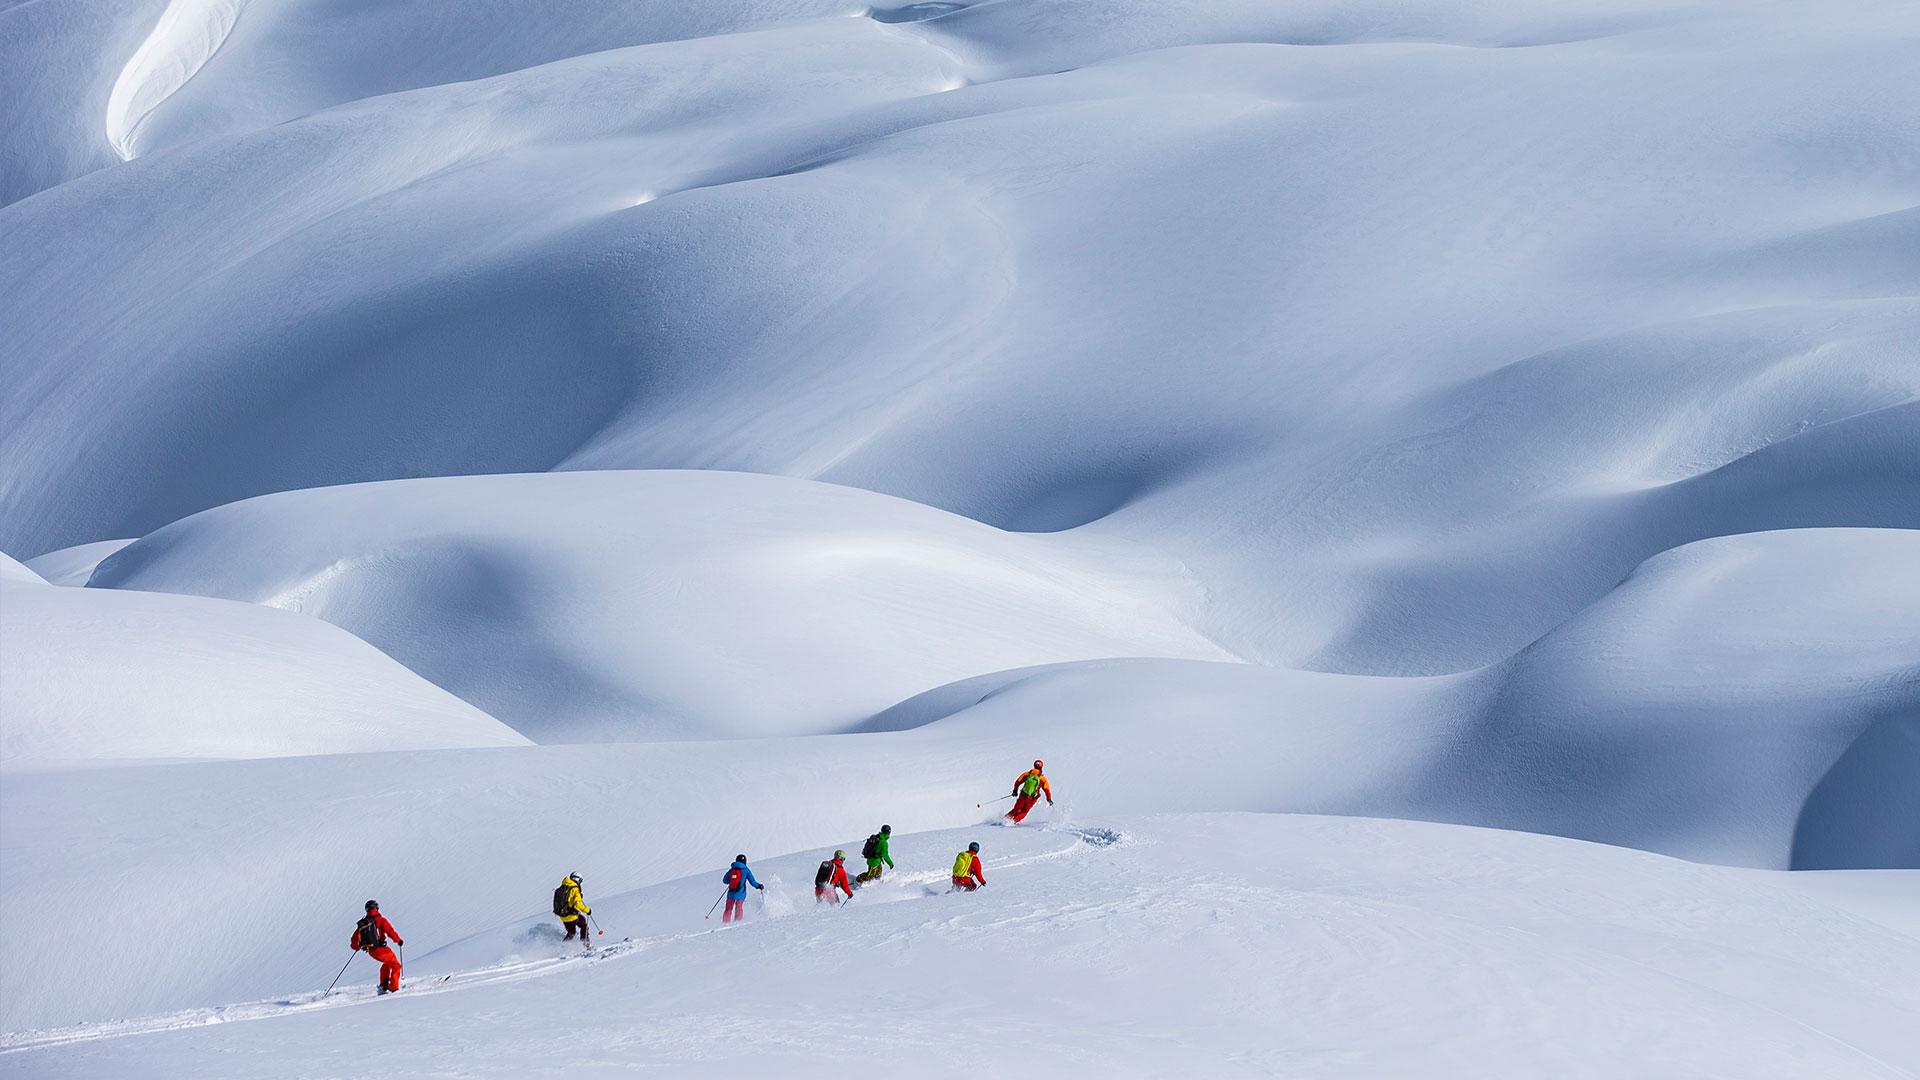 heli-skiing group skiing down mountain in Canada